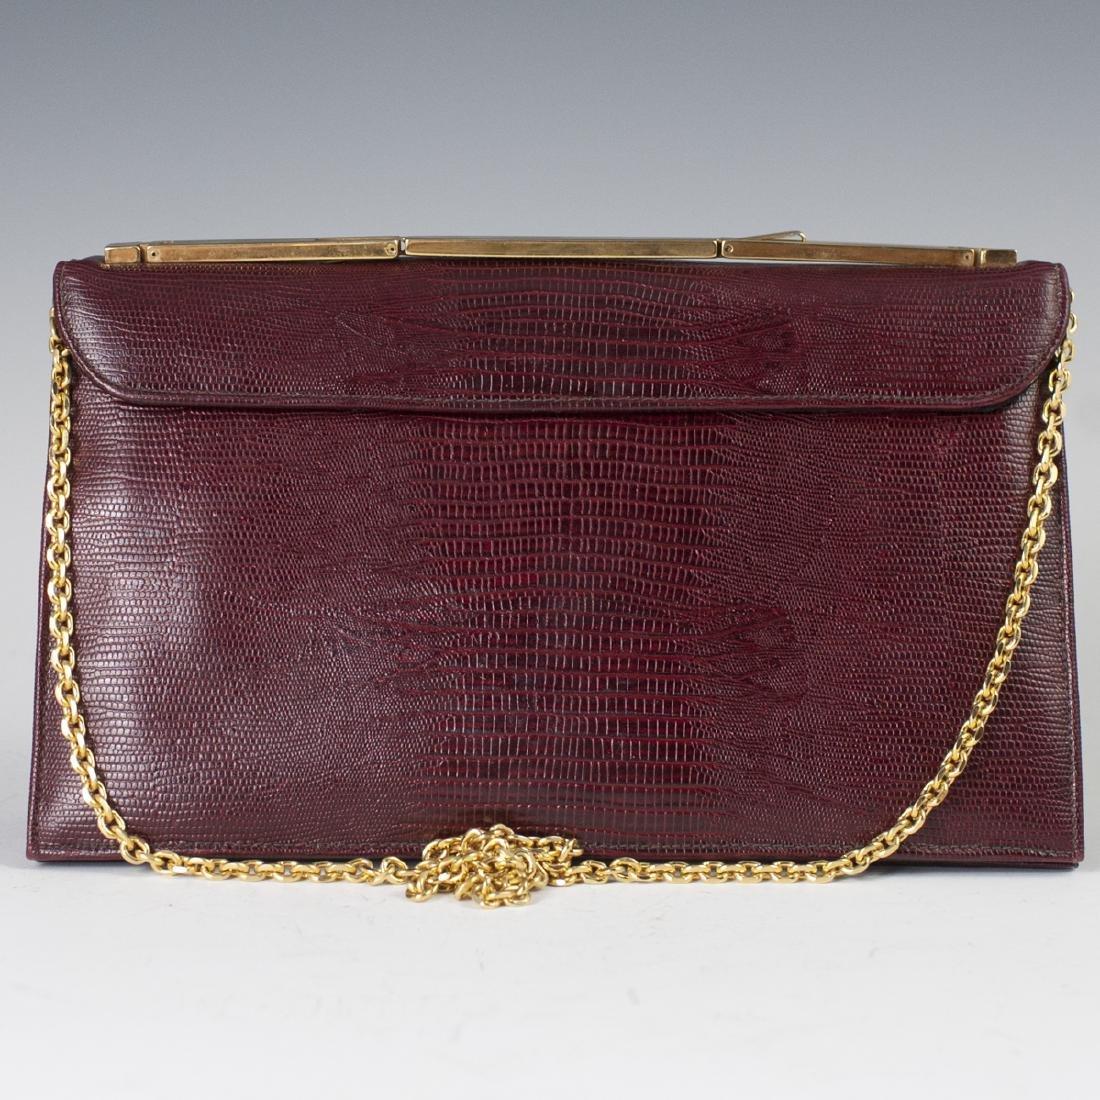 Vintage Caprice Snake Leather Purse